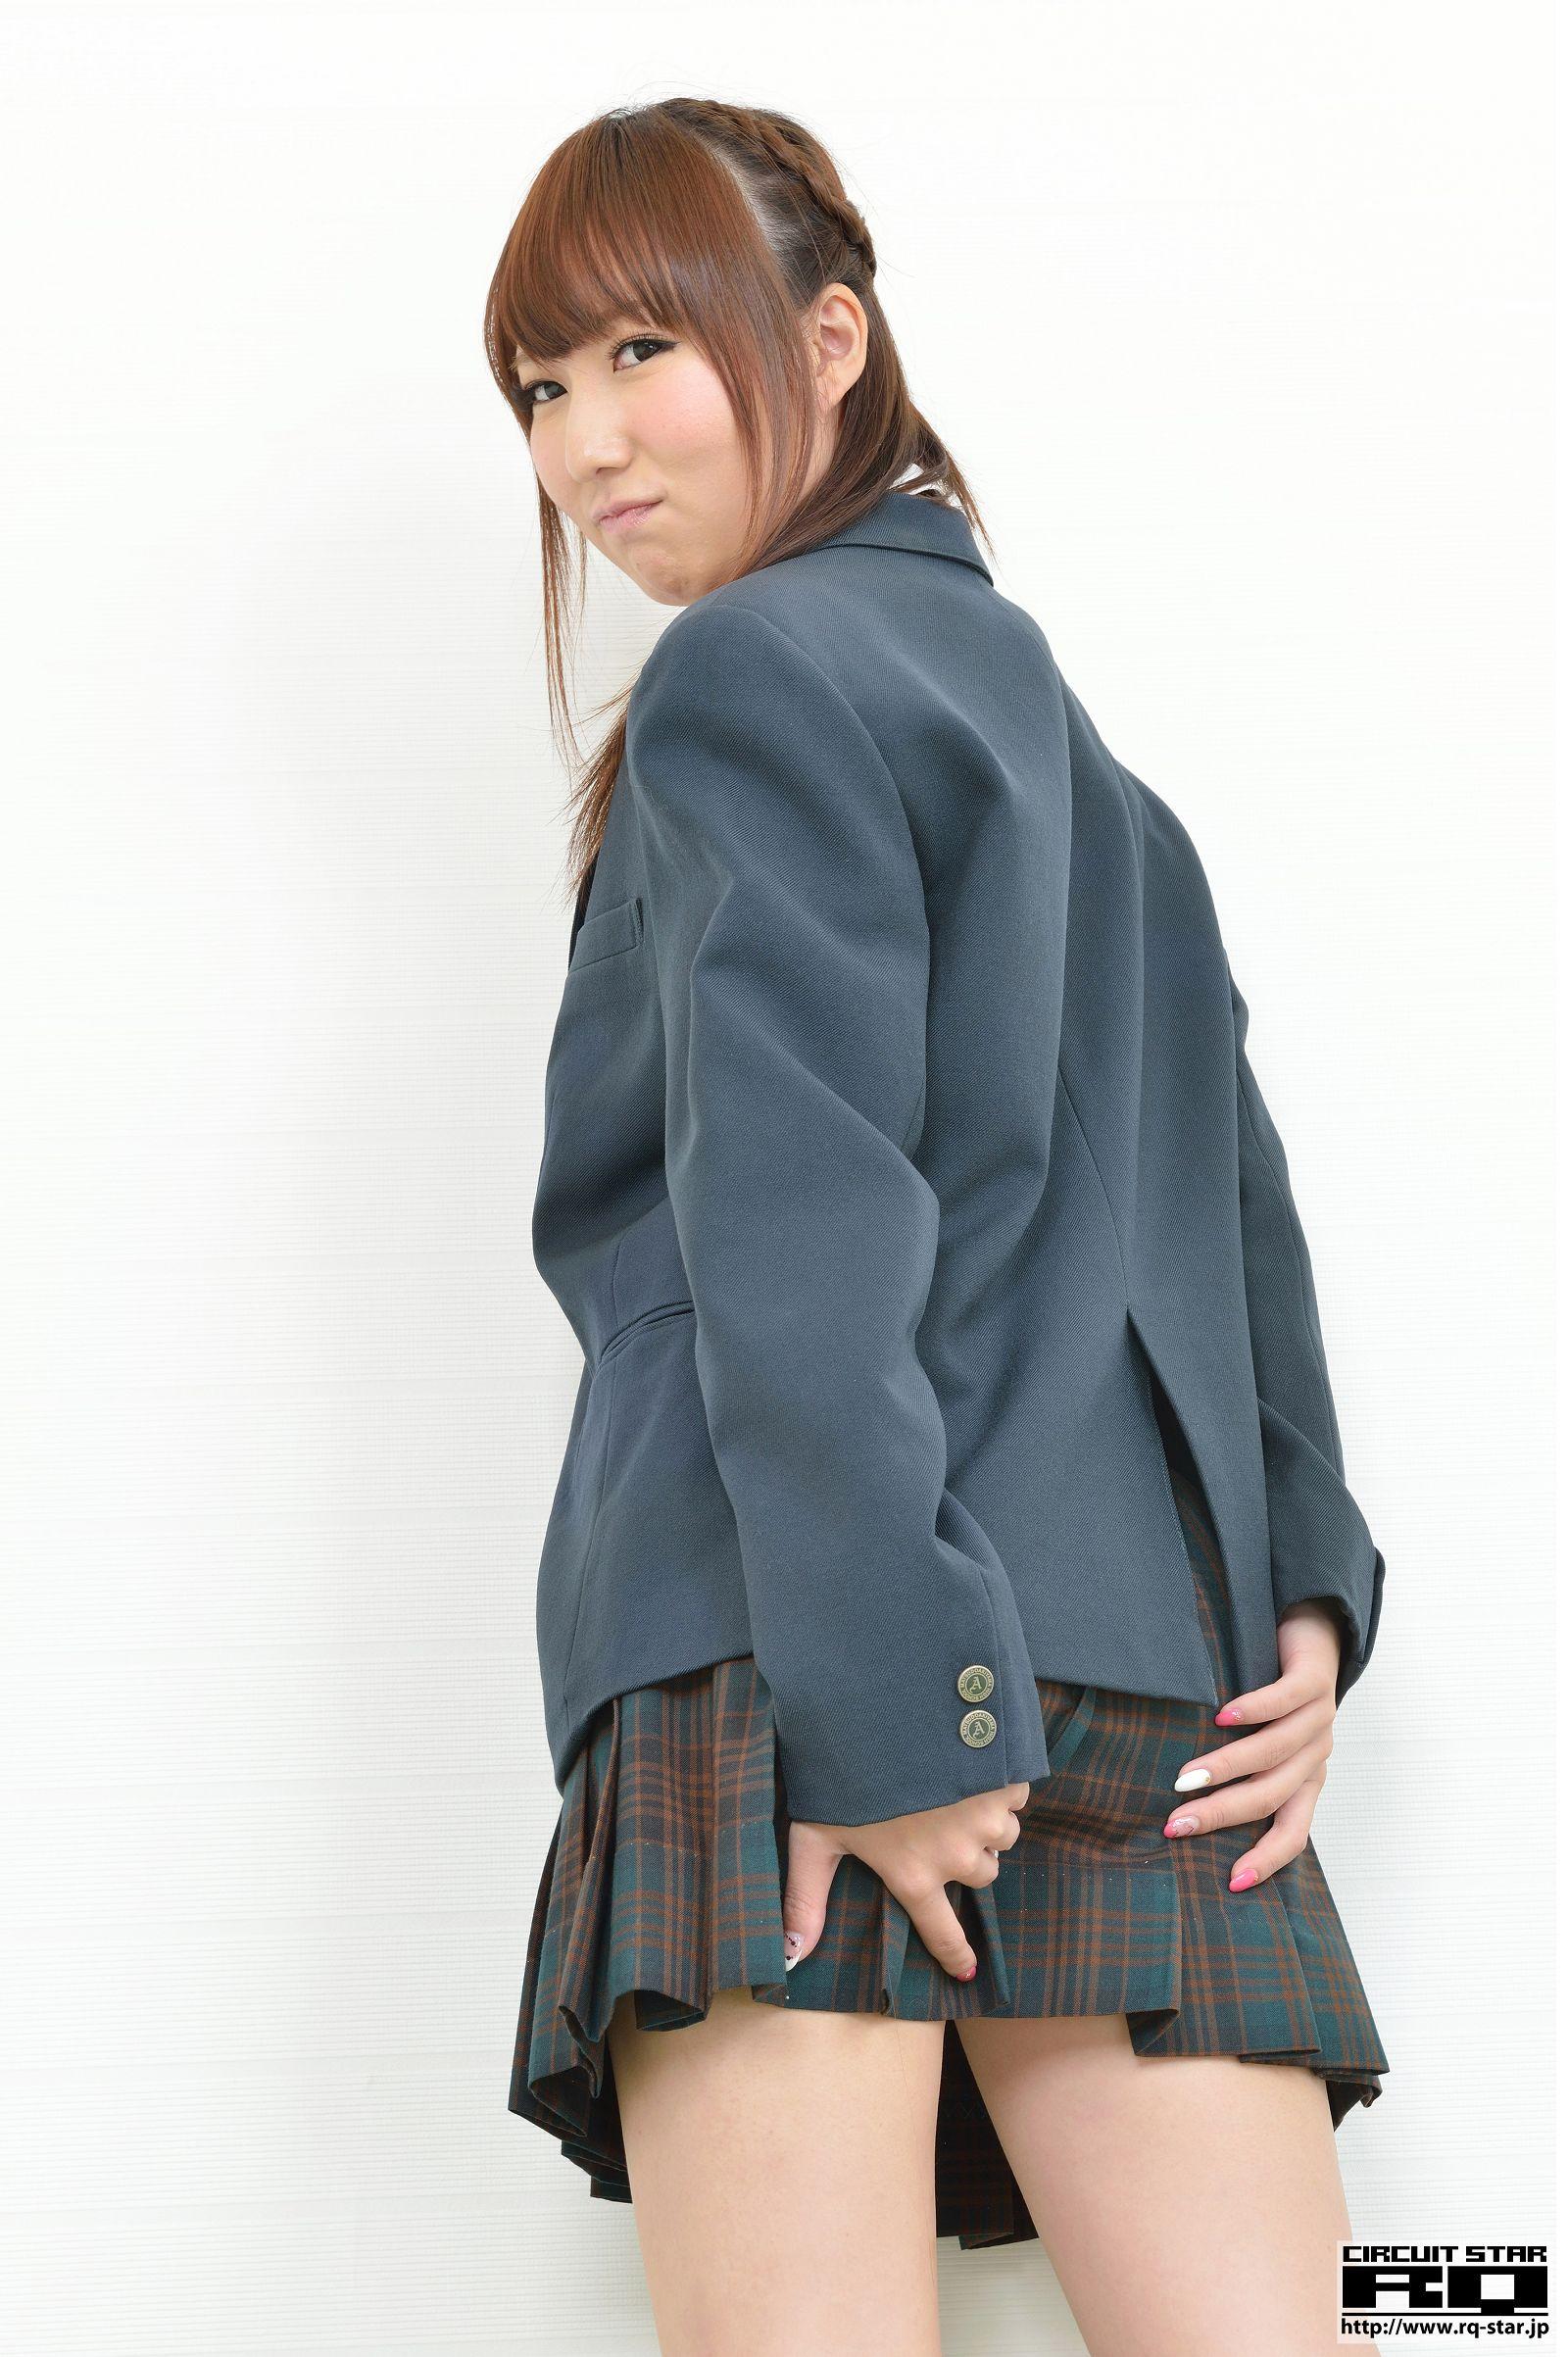 [RQ STAR美女] NO.00989 Nanami Takahashi 高橋七海 School Girl[90P] RQ STAR 第3张